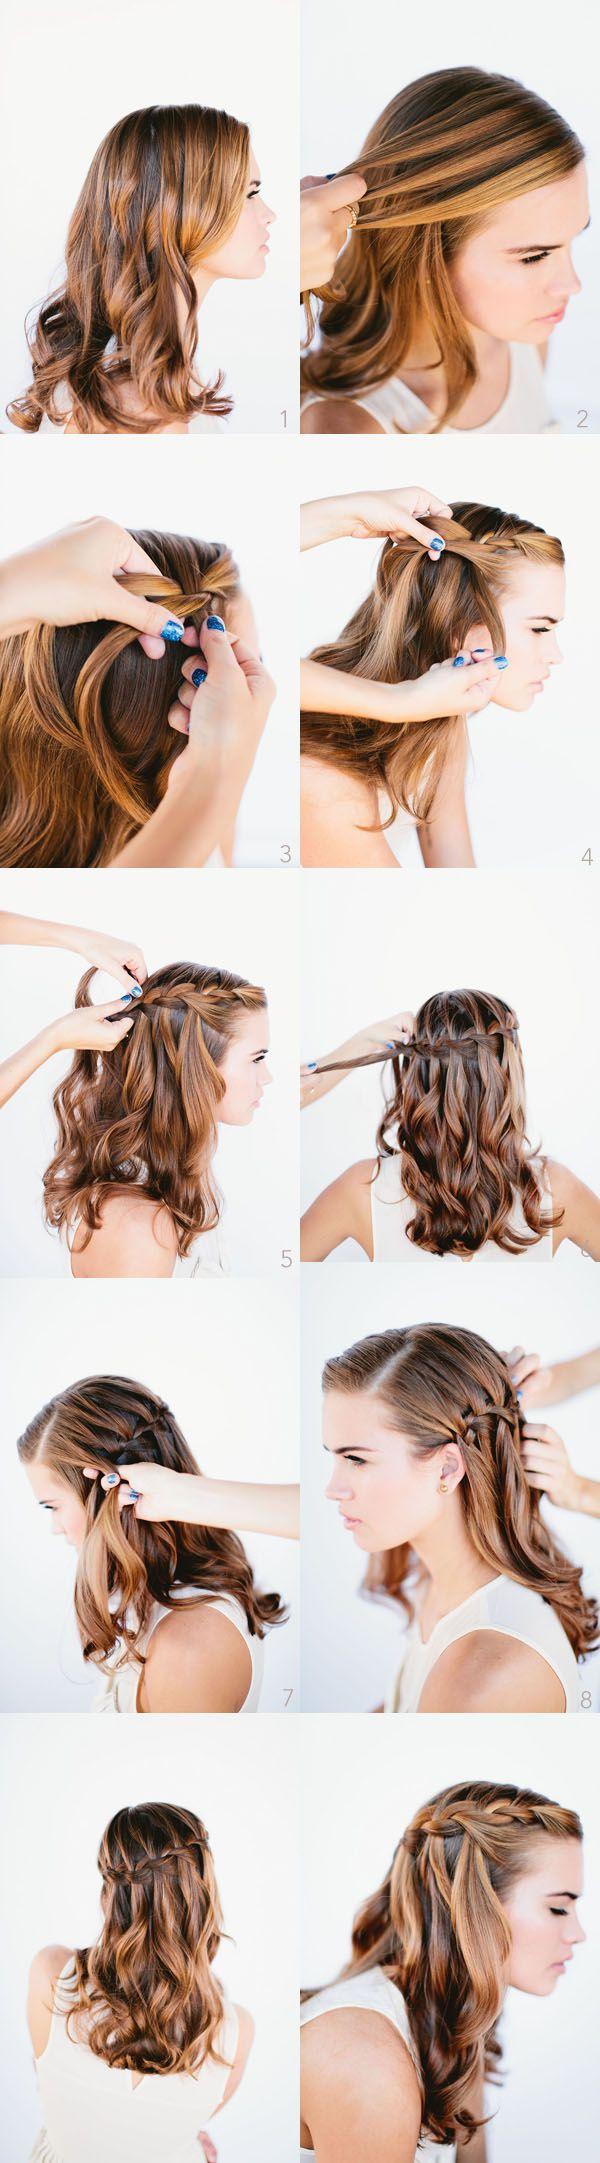 Girls Hair Styles -                                                              How to do a Waterfall Braid Tutorial